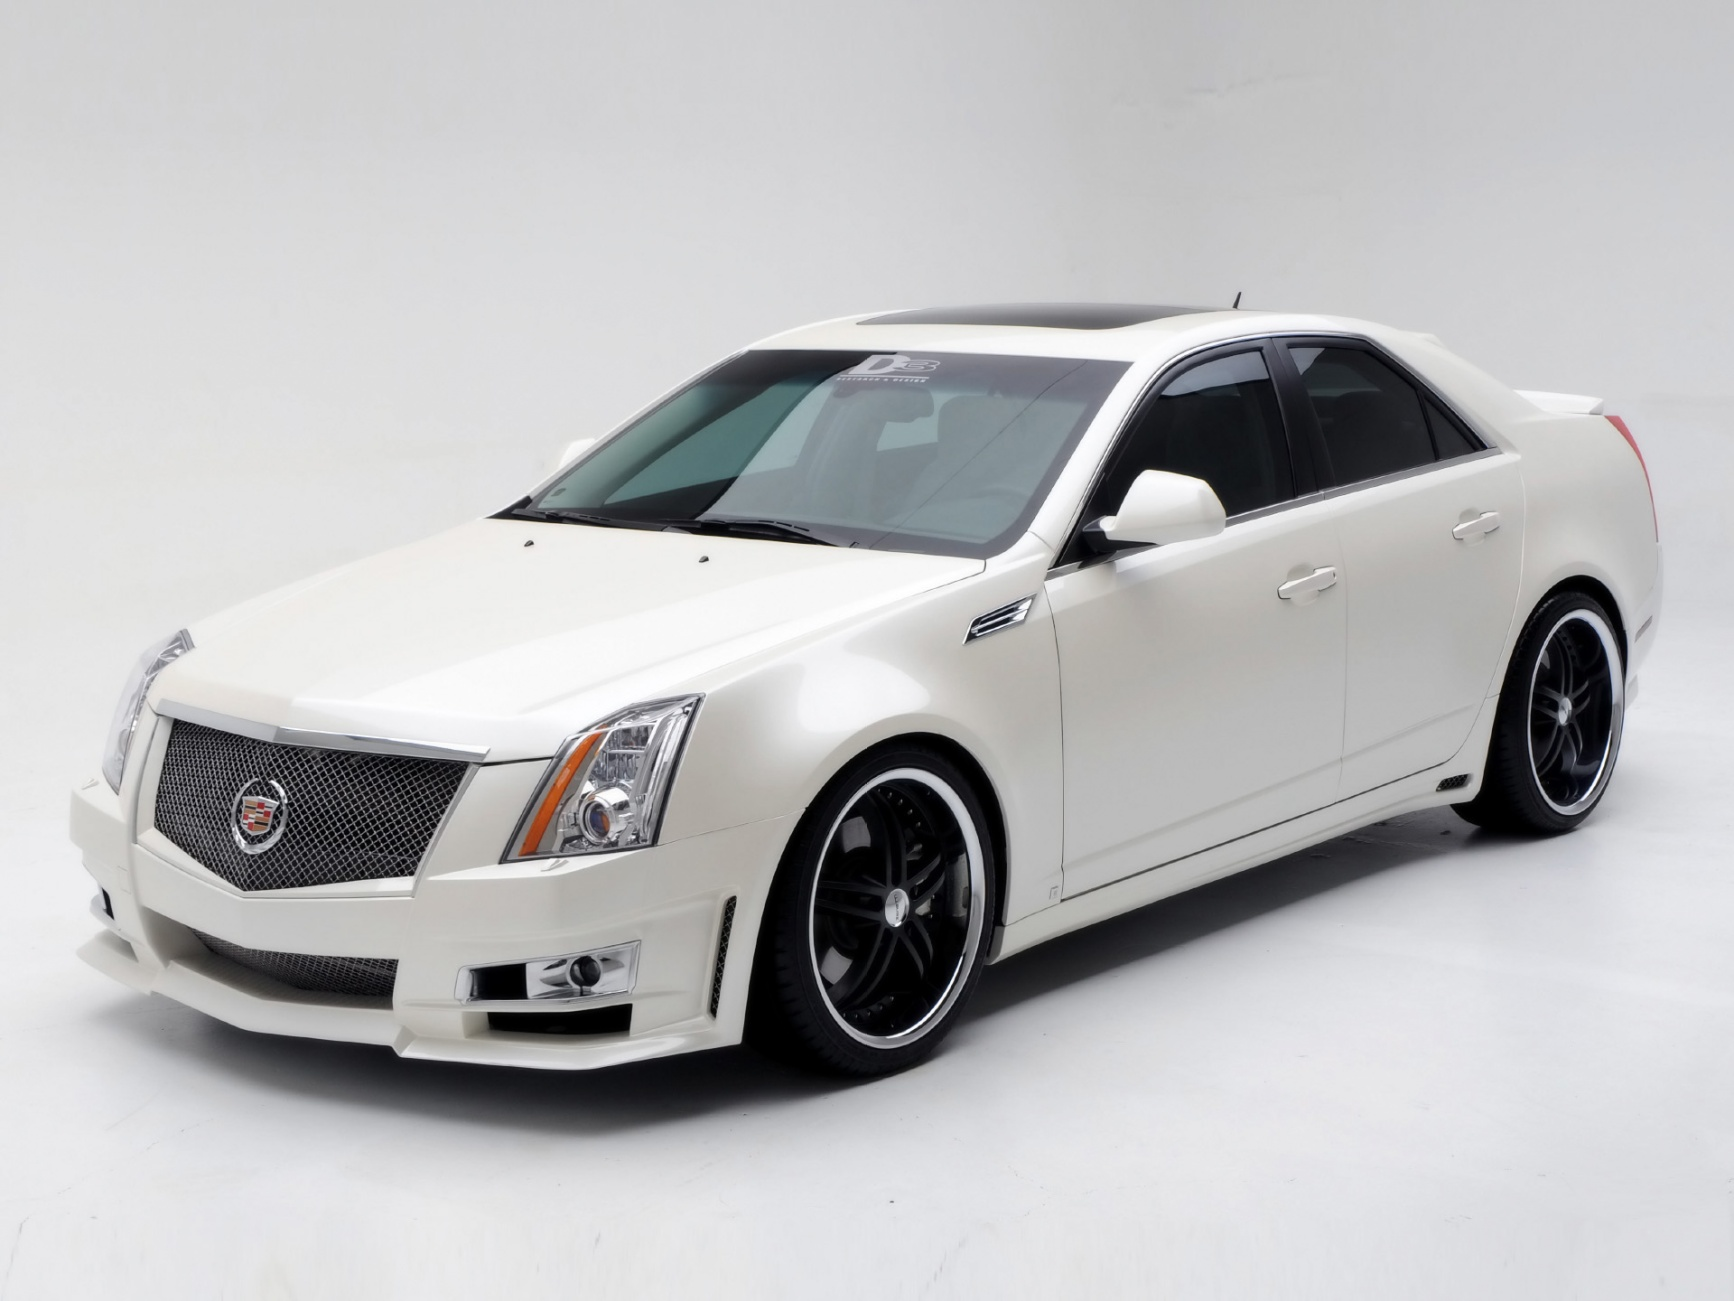 Nuevo Cadillac CTS - 1734x1301